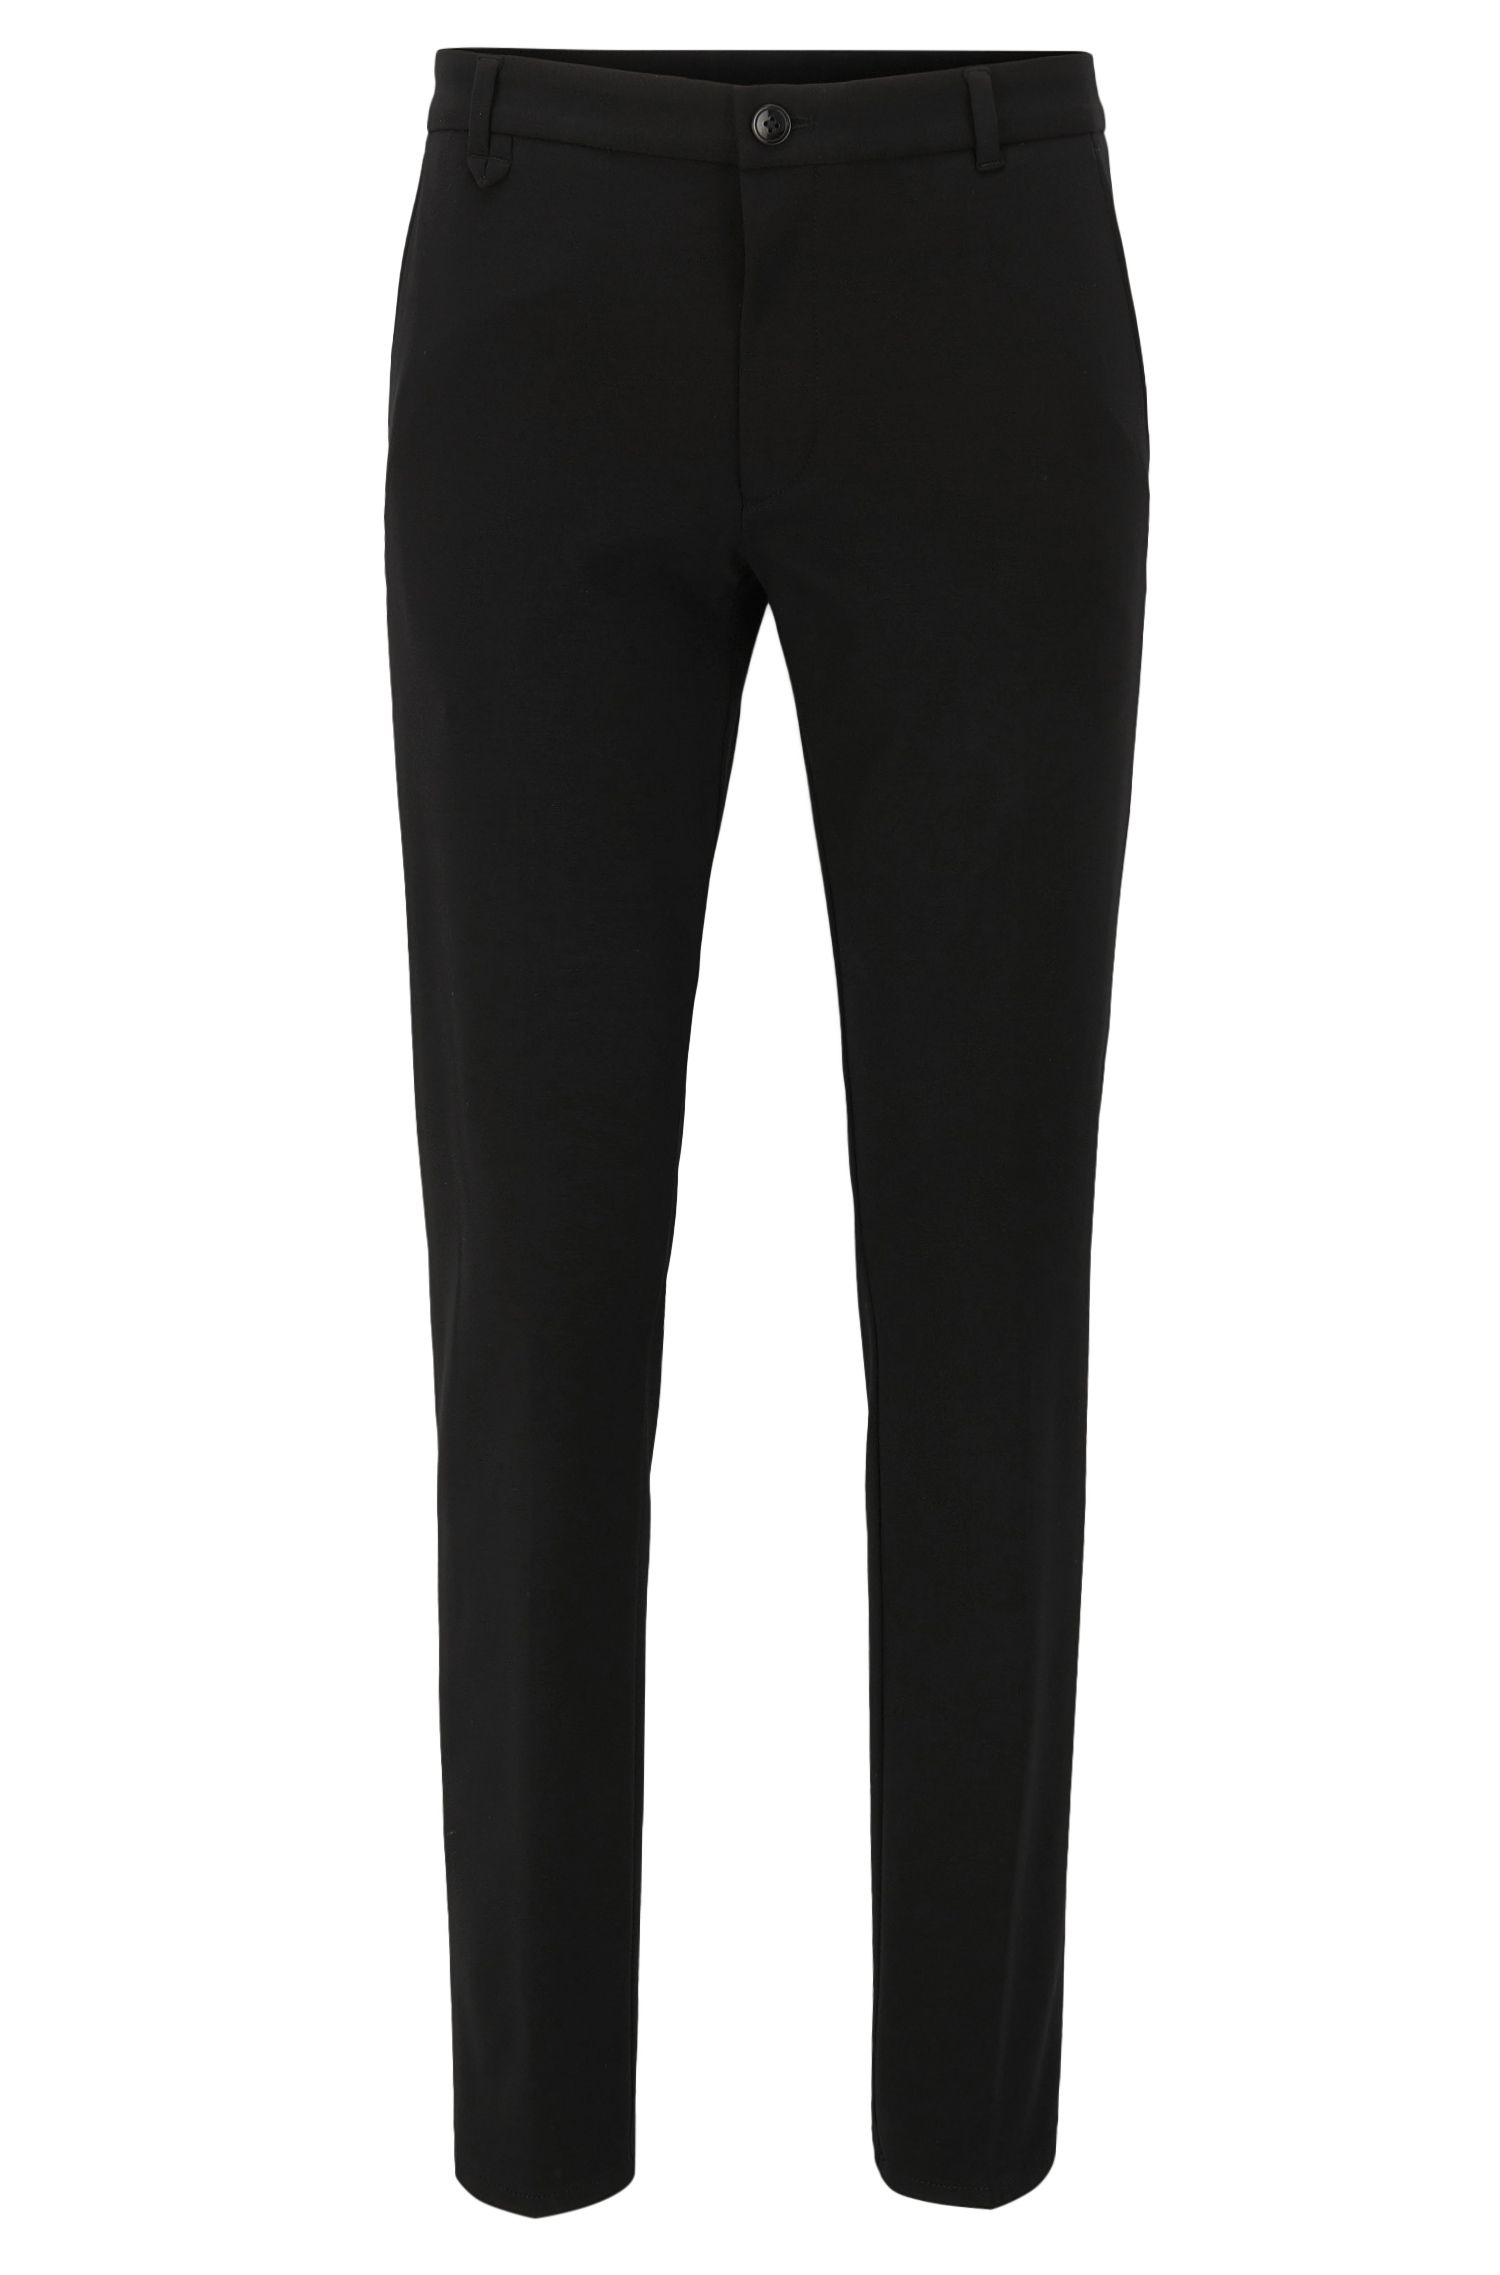 Stretch Viscose Pants, Extra Slim Fit | Heldor, Black